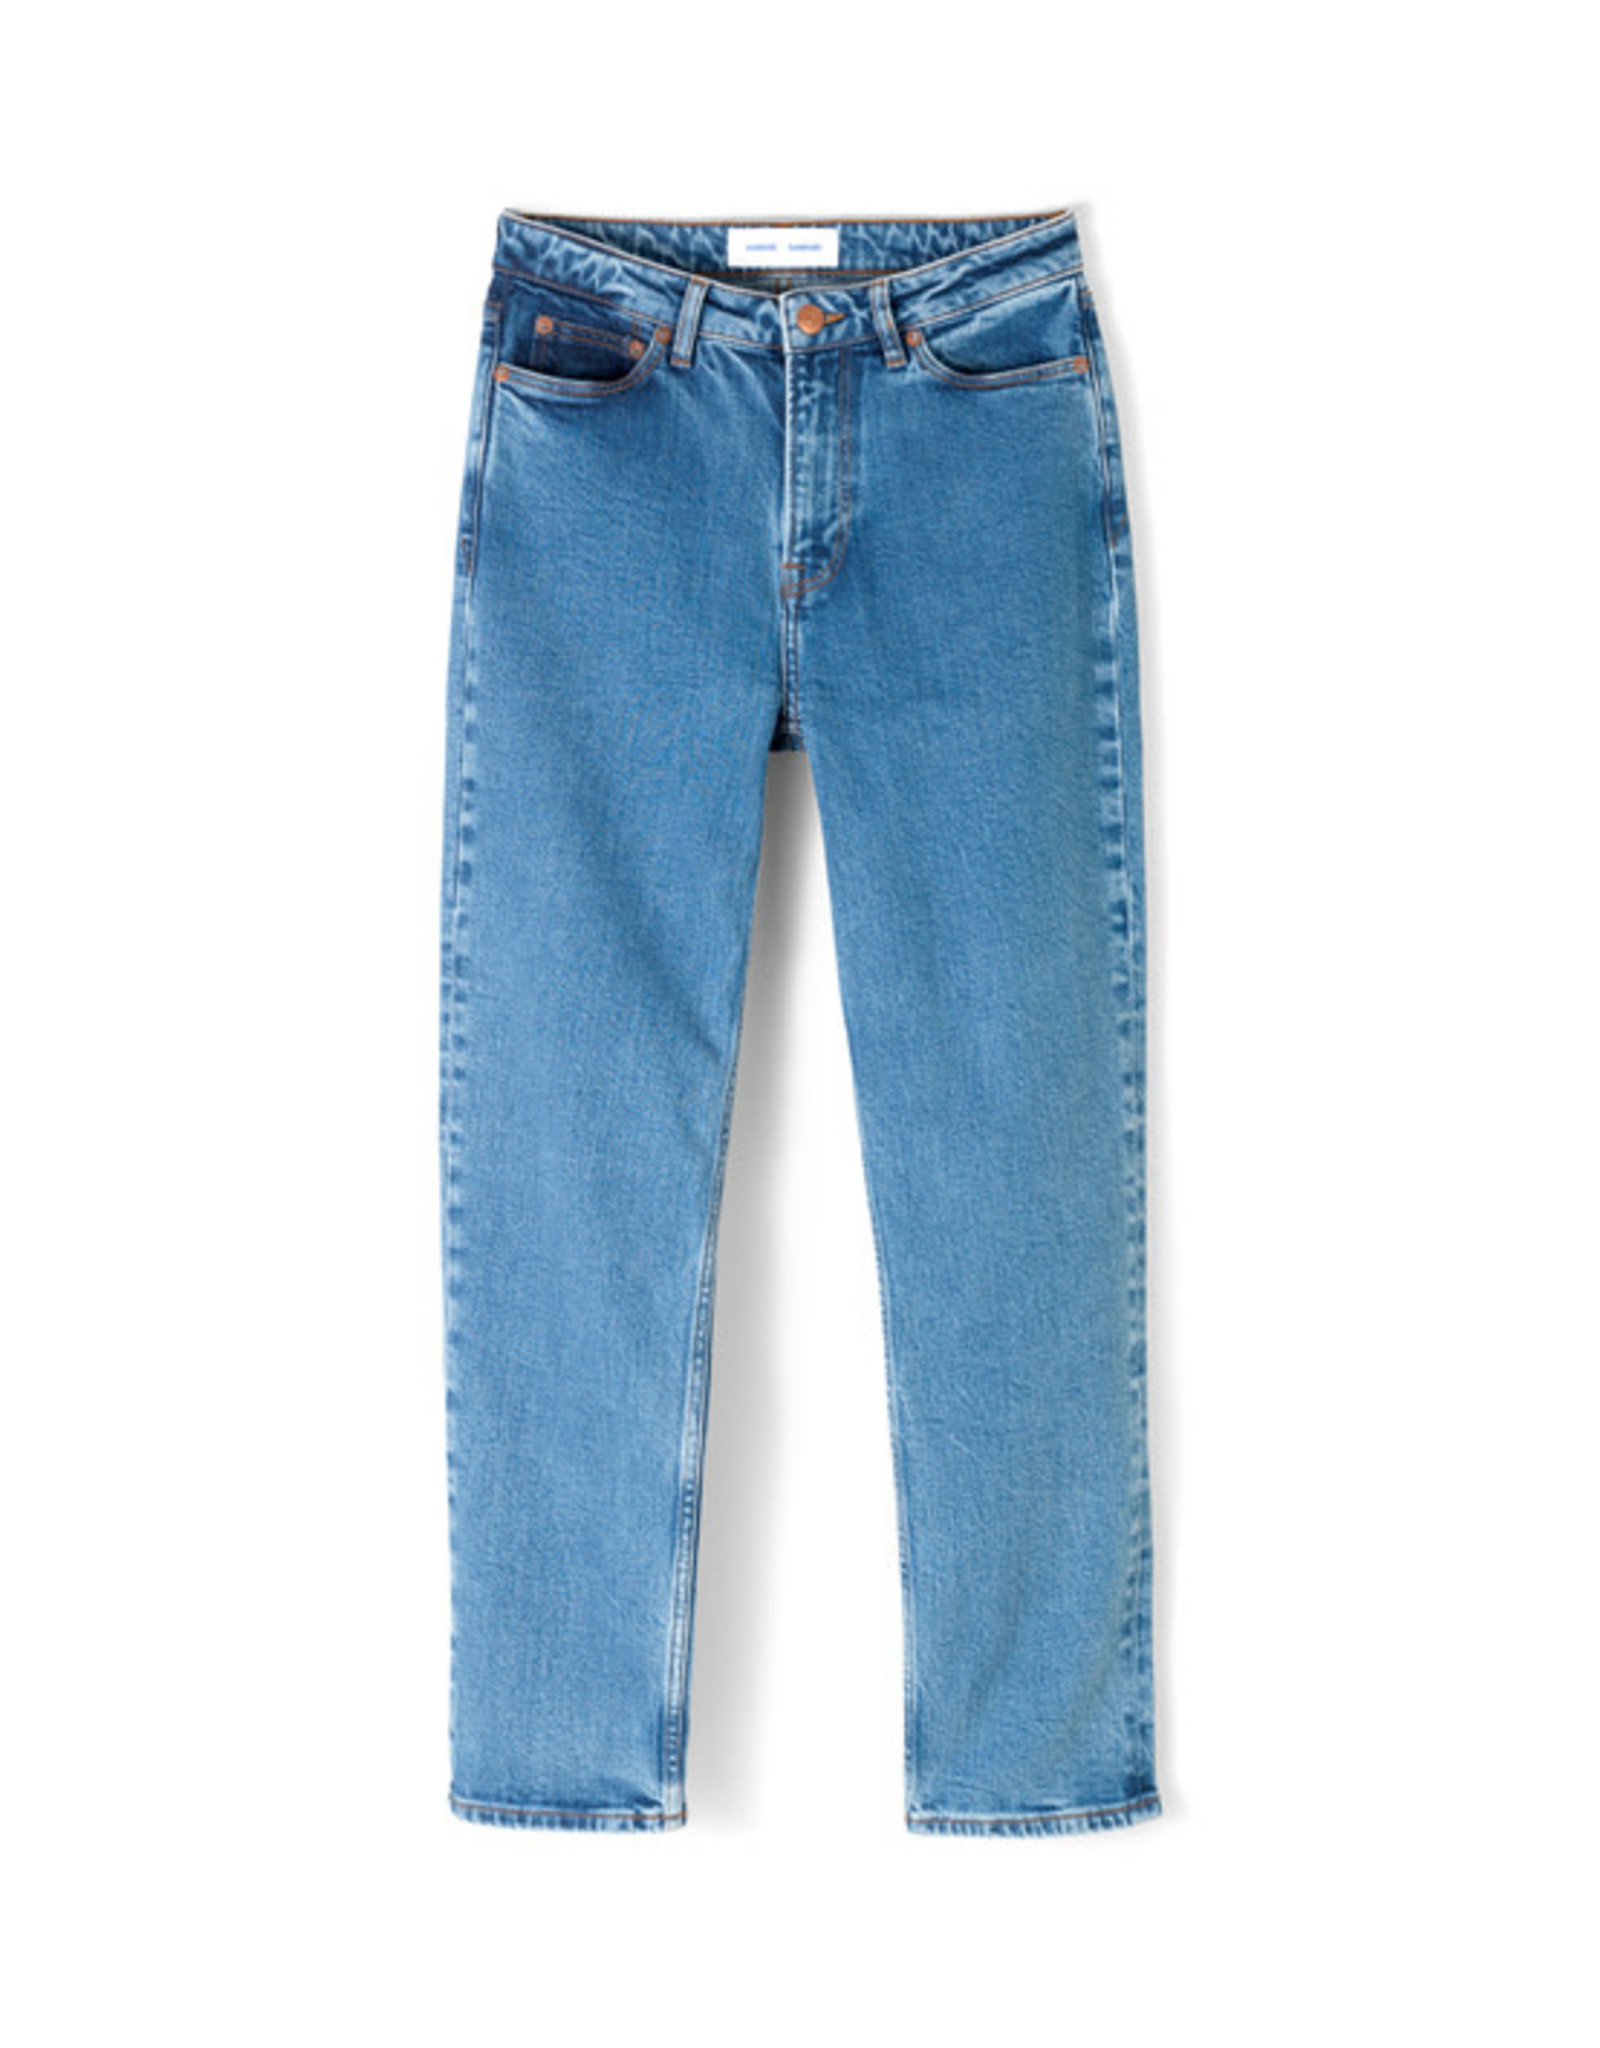 Samsoe & Samsoe Marianne jeans 11354